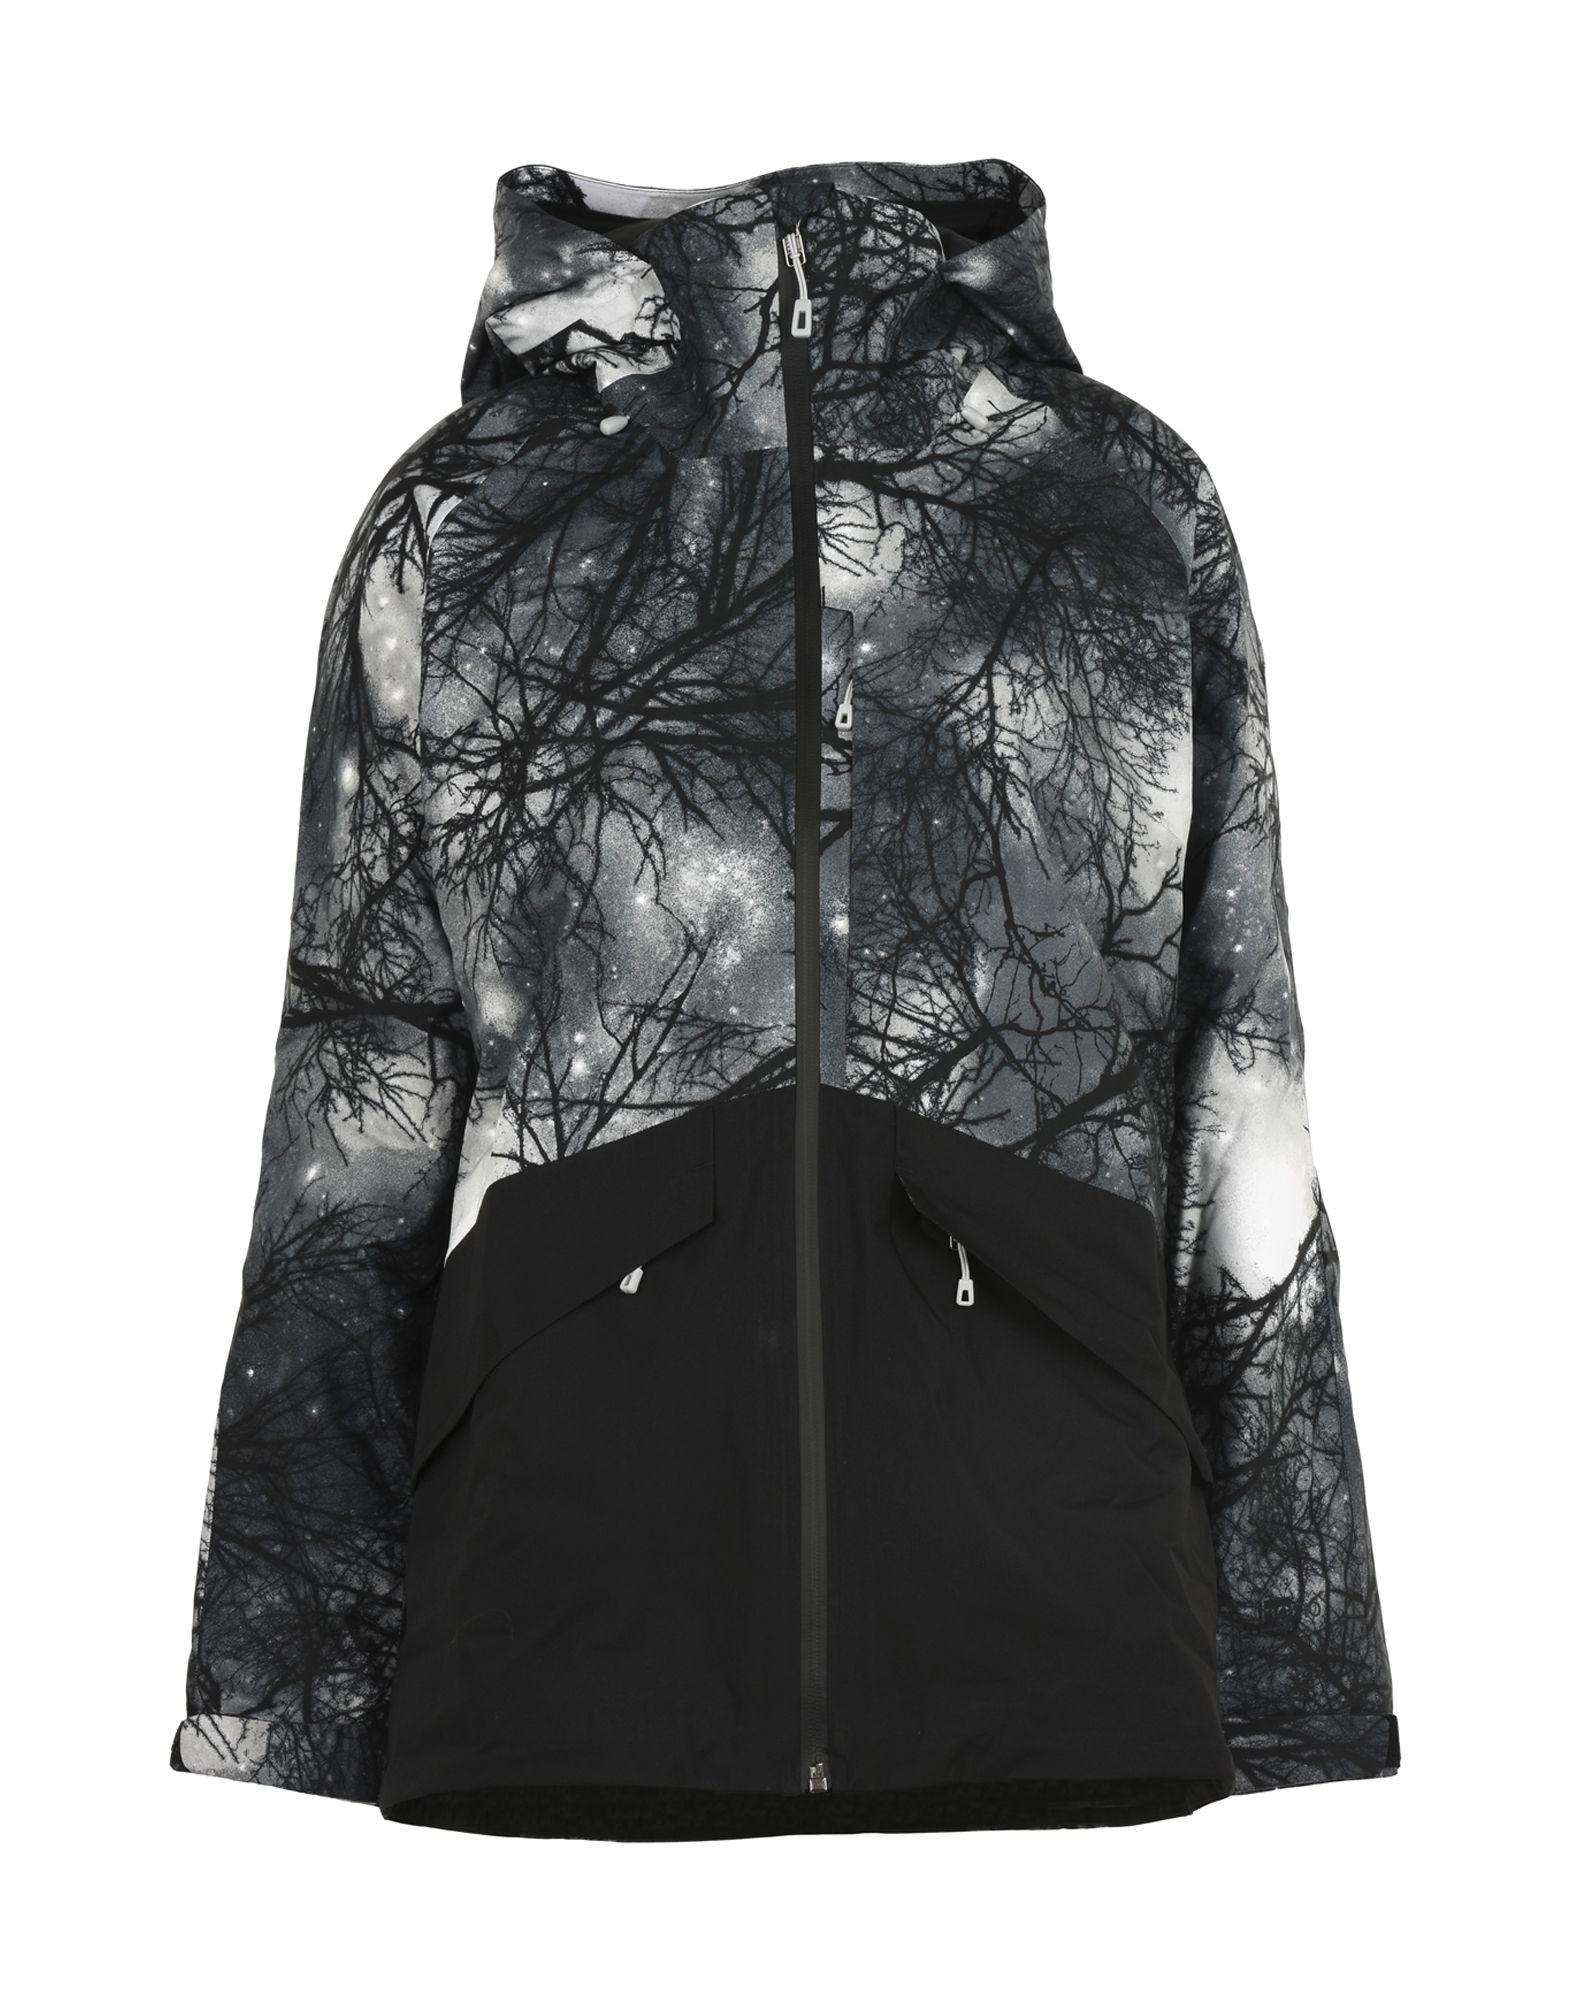 Giubbotto Patagonia W's Insulated Snowbelle Jacket - Donna - Acquista online su 5Equn